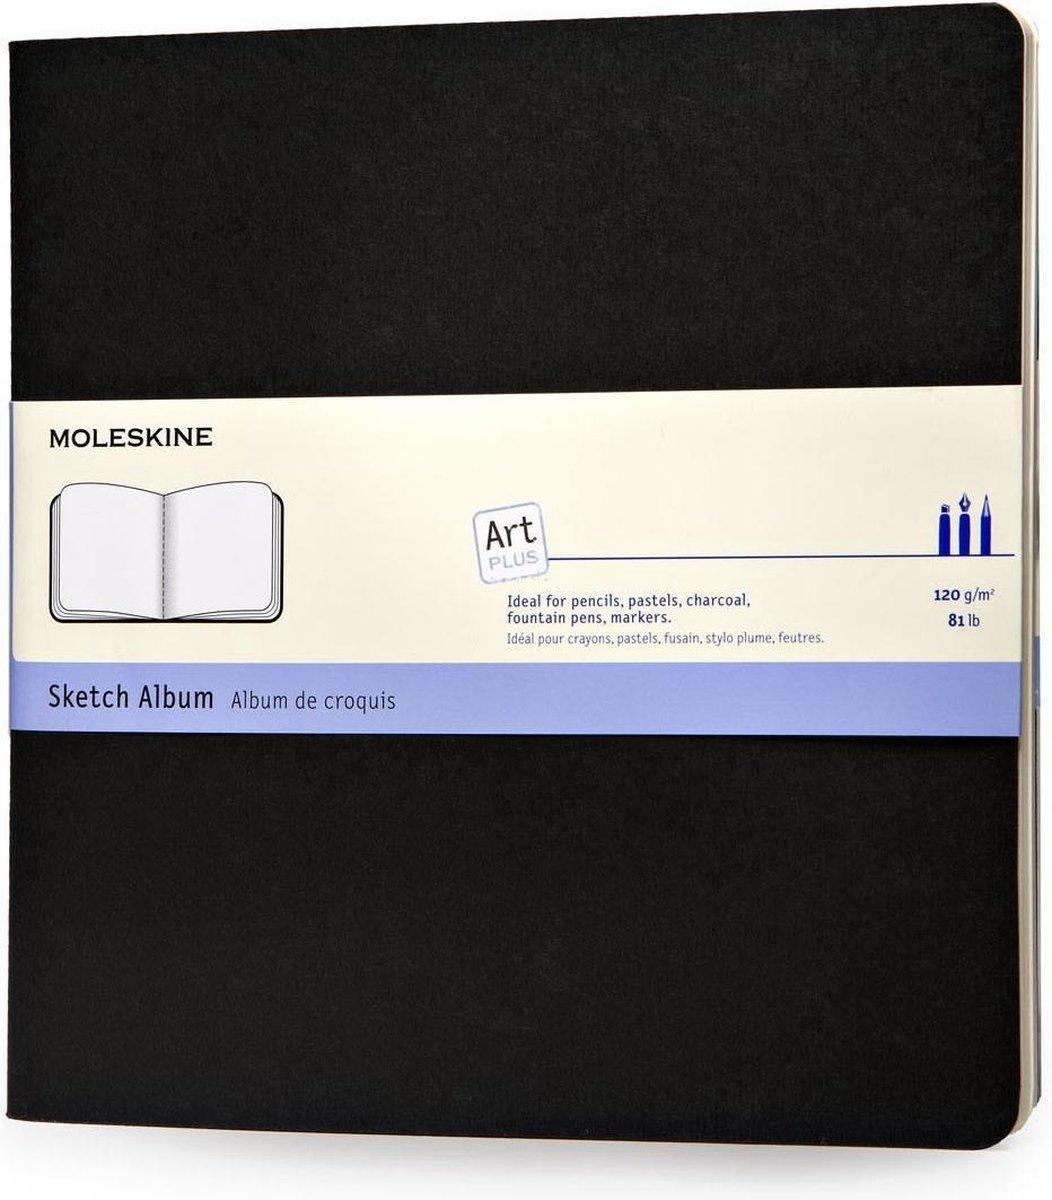 Moleskine Art Schetsboek Vierkant (19x19) - Soft cover - Blanco - Zwart